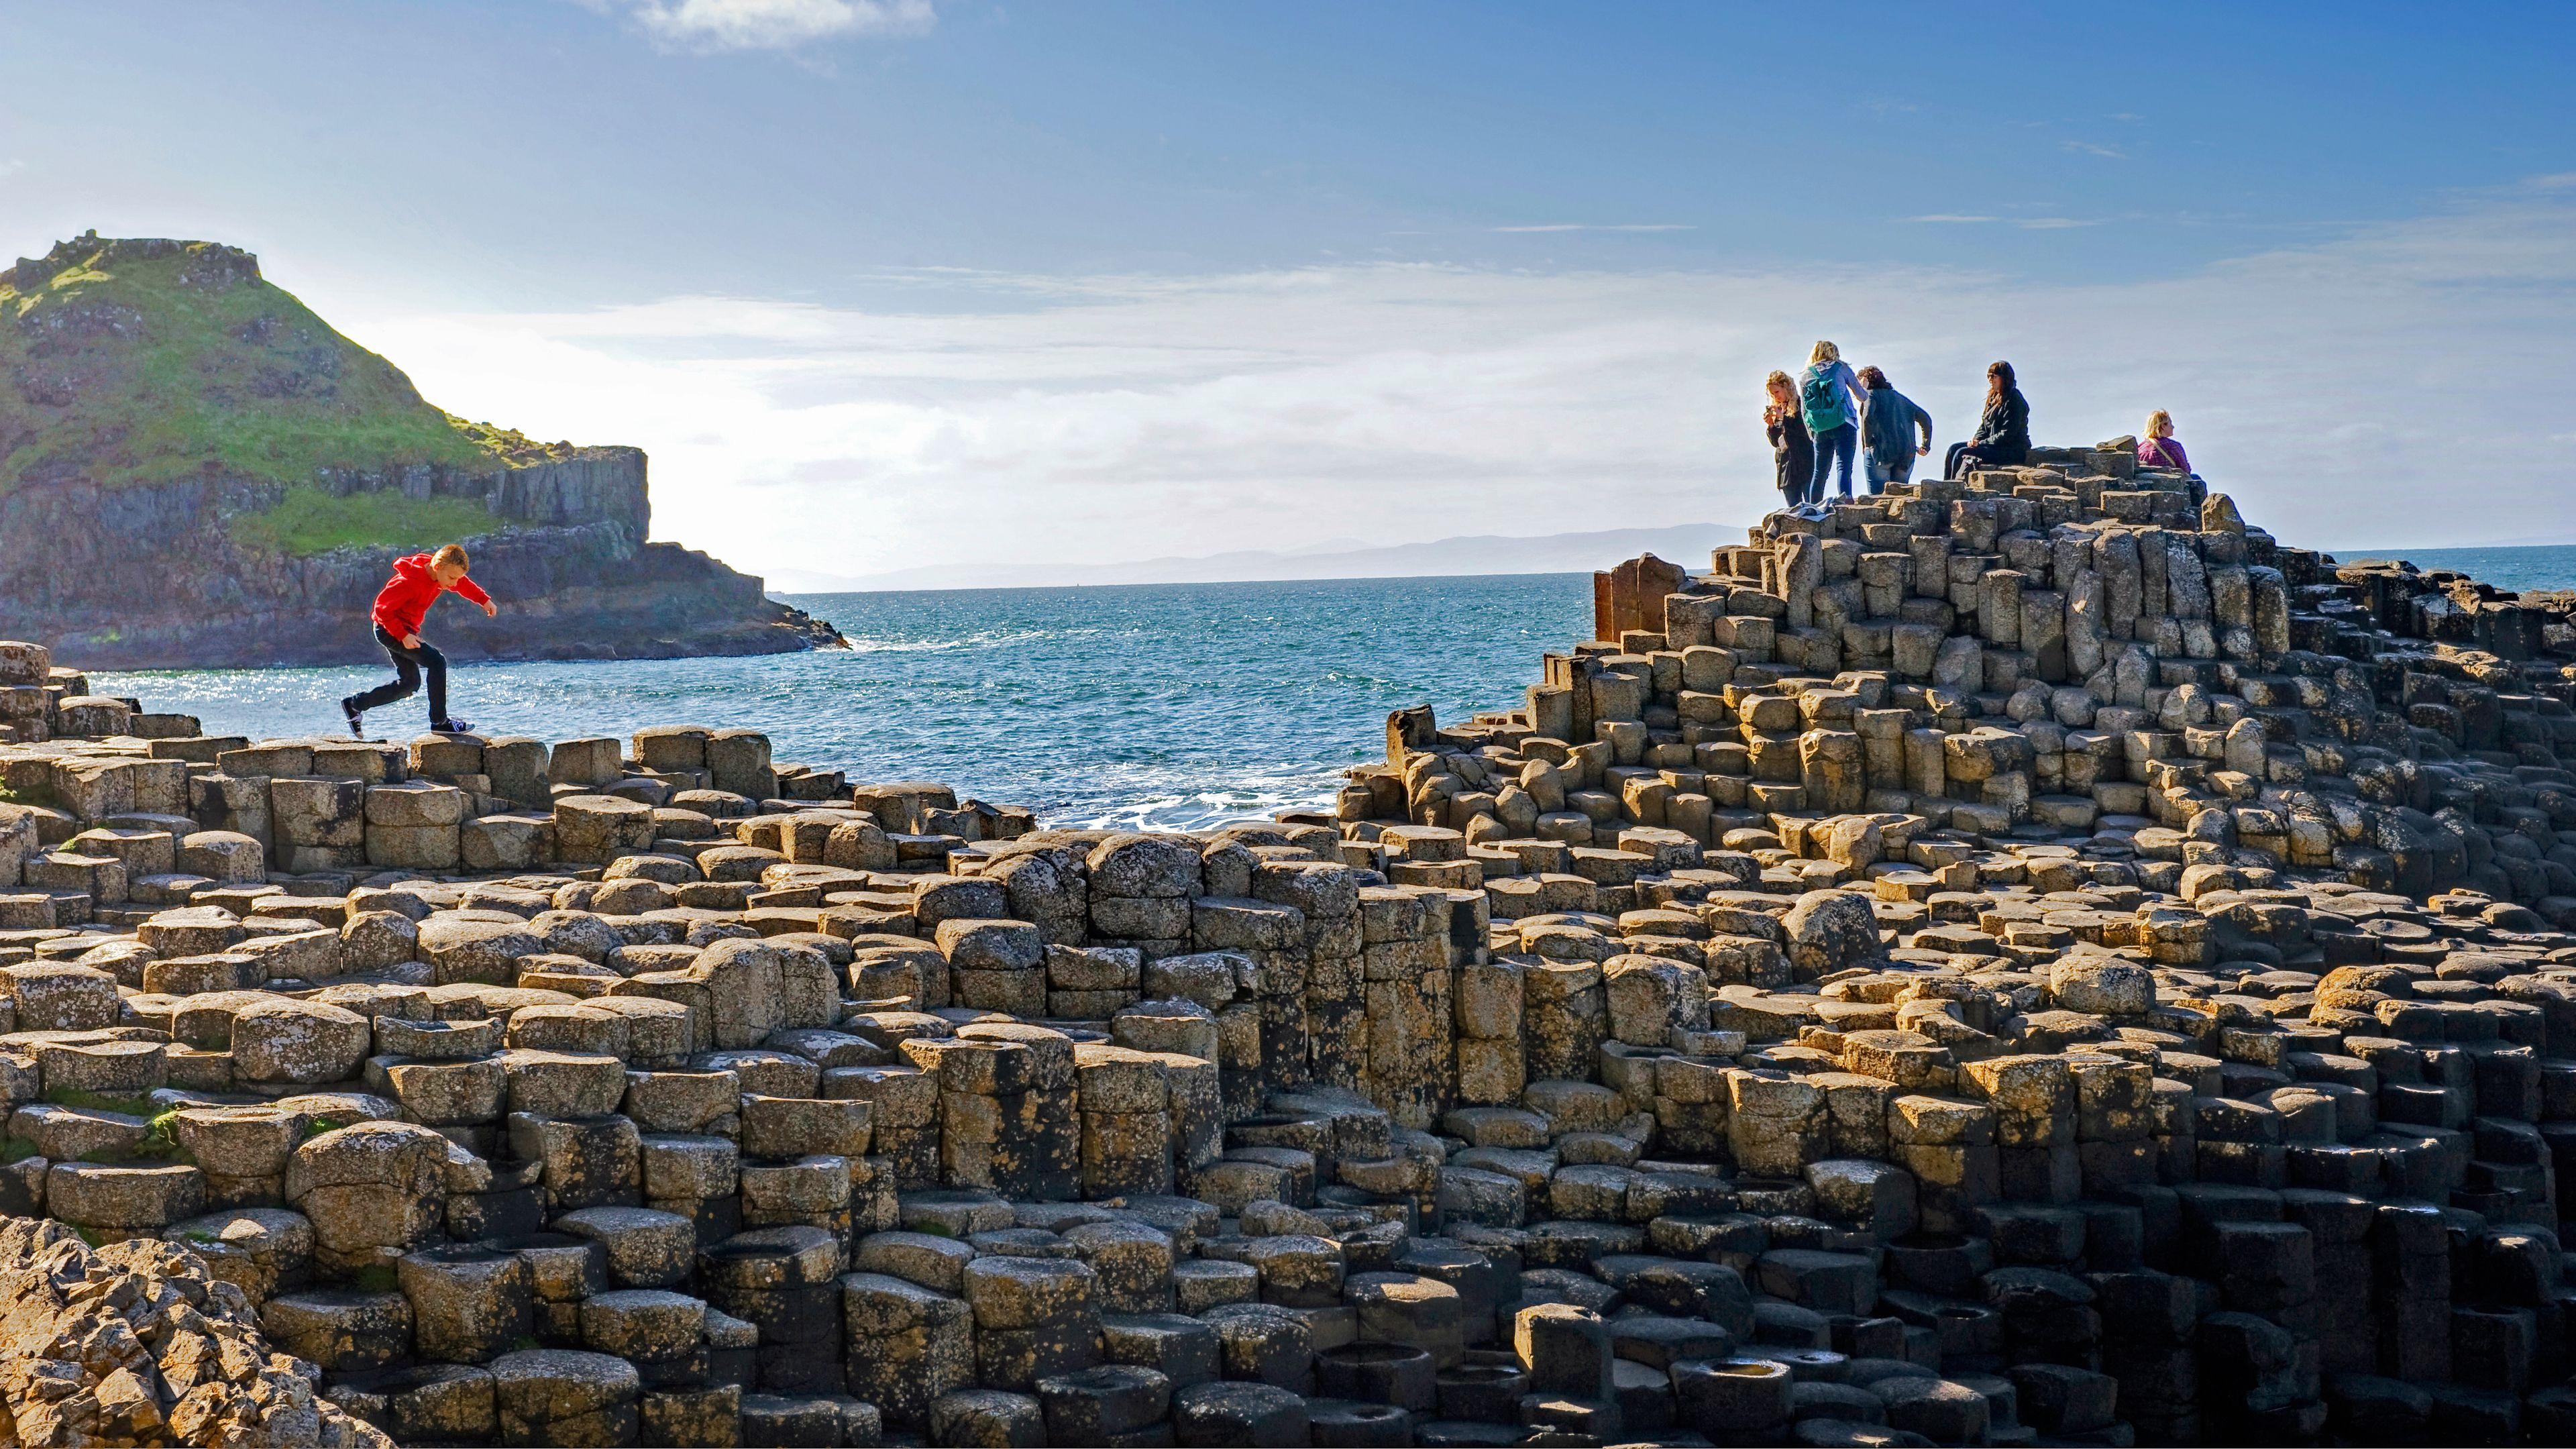 people walking on rock formations in ireland